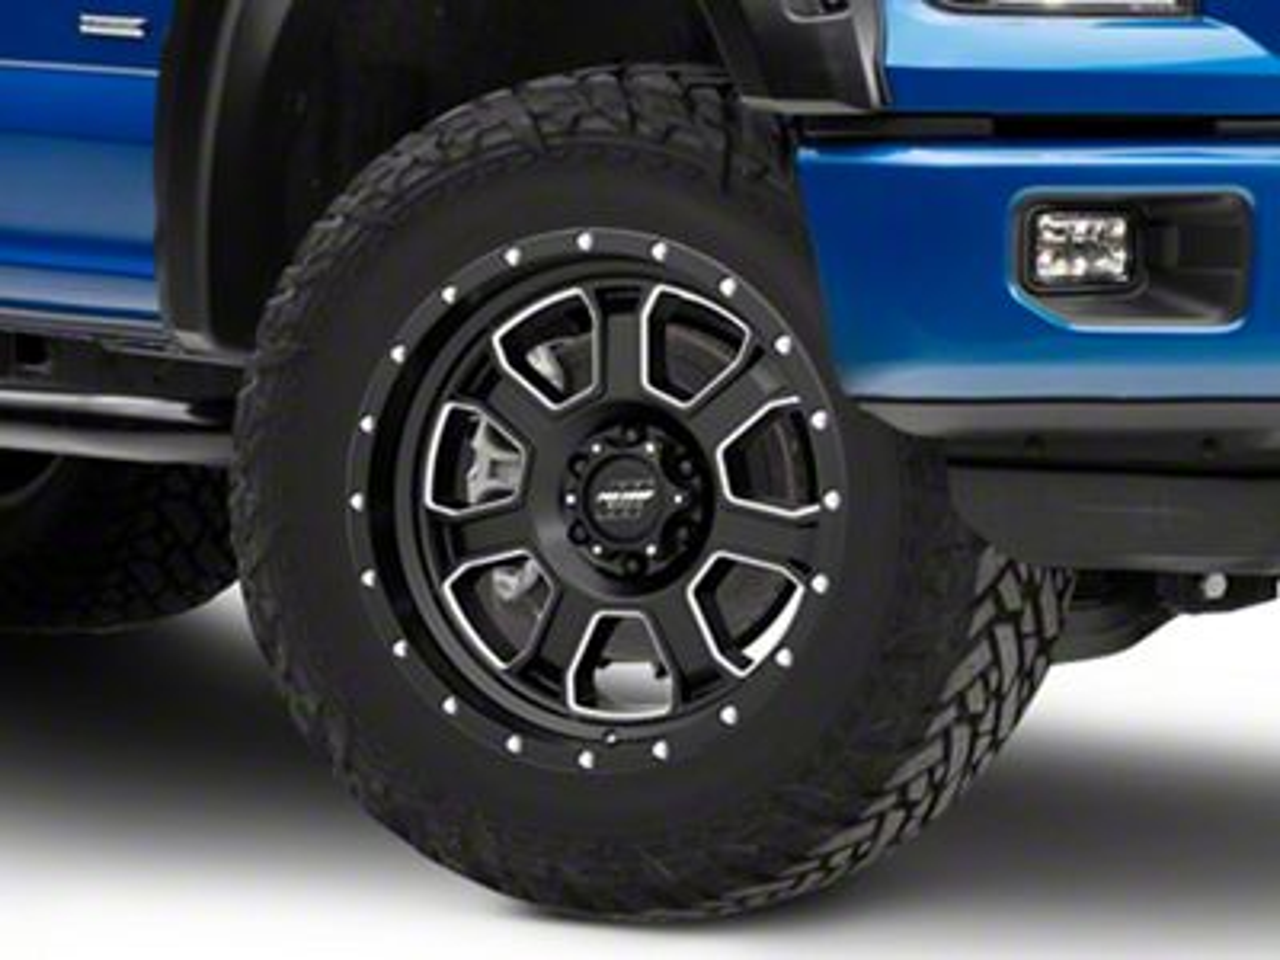 Pro Comp Sledge Satin Black Milled 6-Lug Wheel - 20x9 (04-19 F-150)